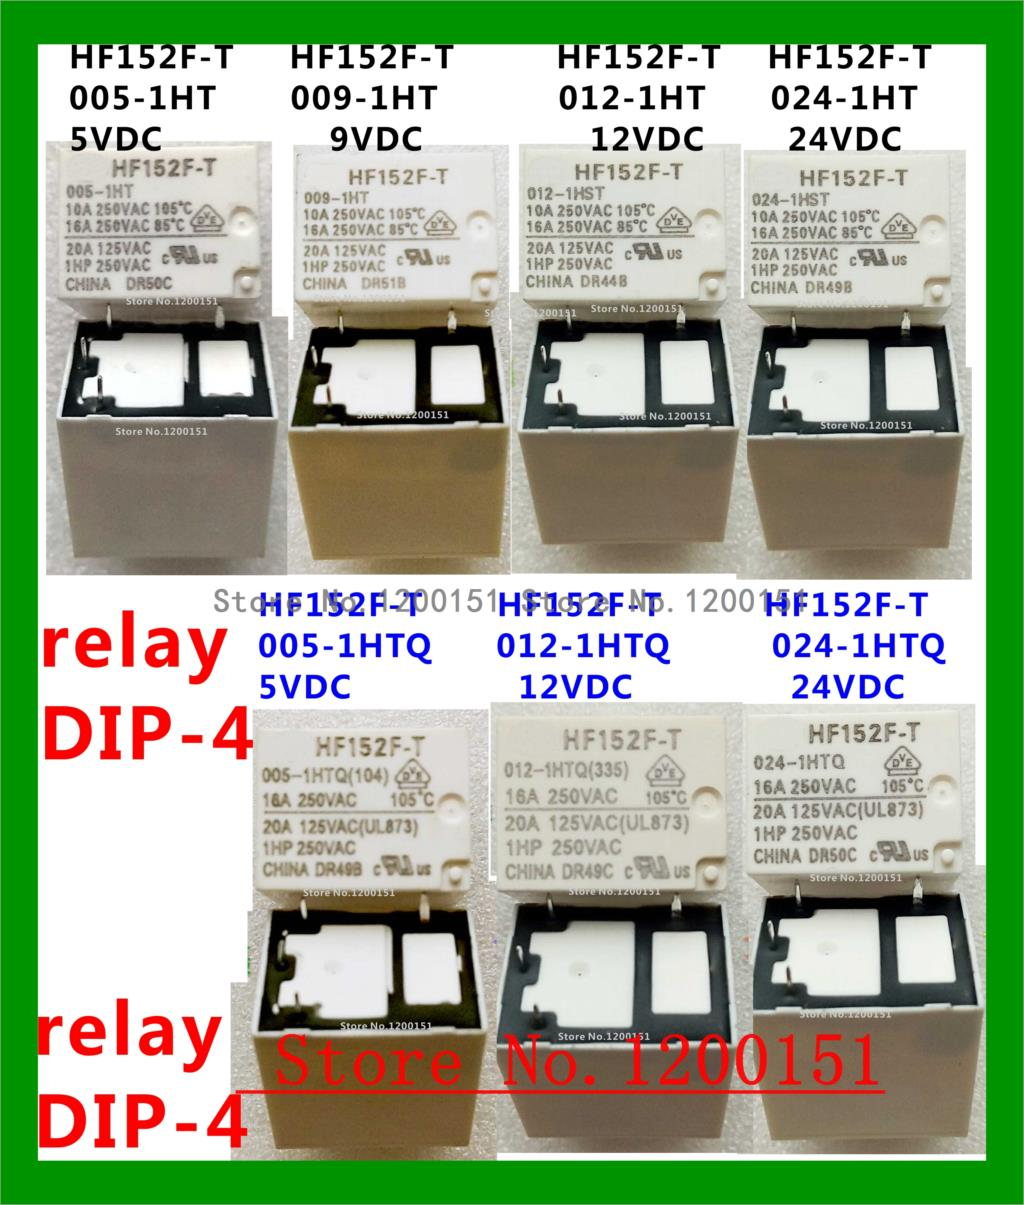 1Pcs PVC Electricians Electrical Insulation Tape White 0.2mmx19mmx10M Sc